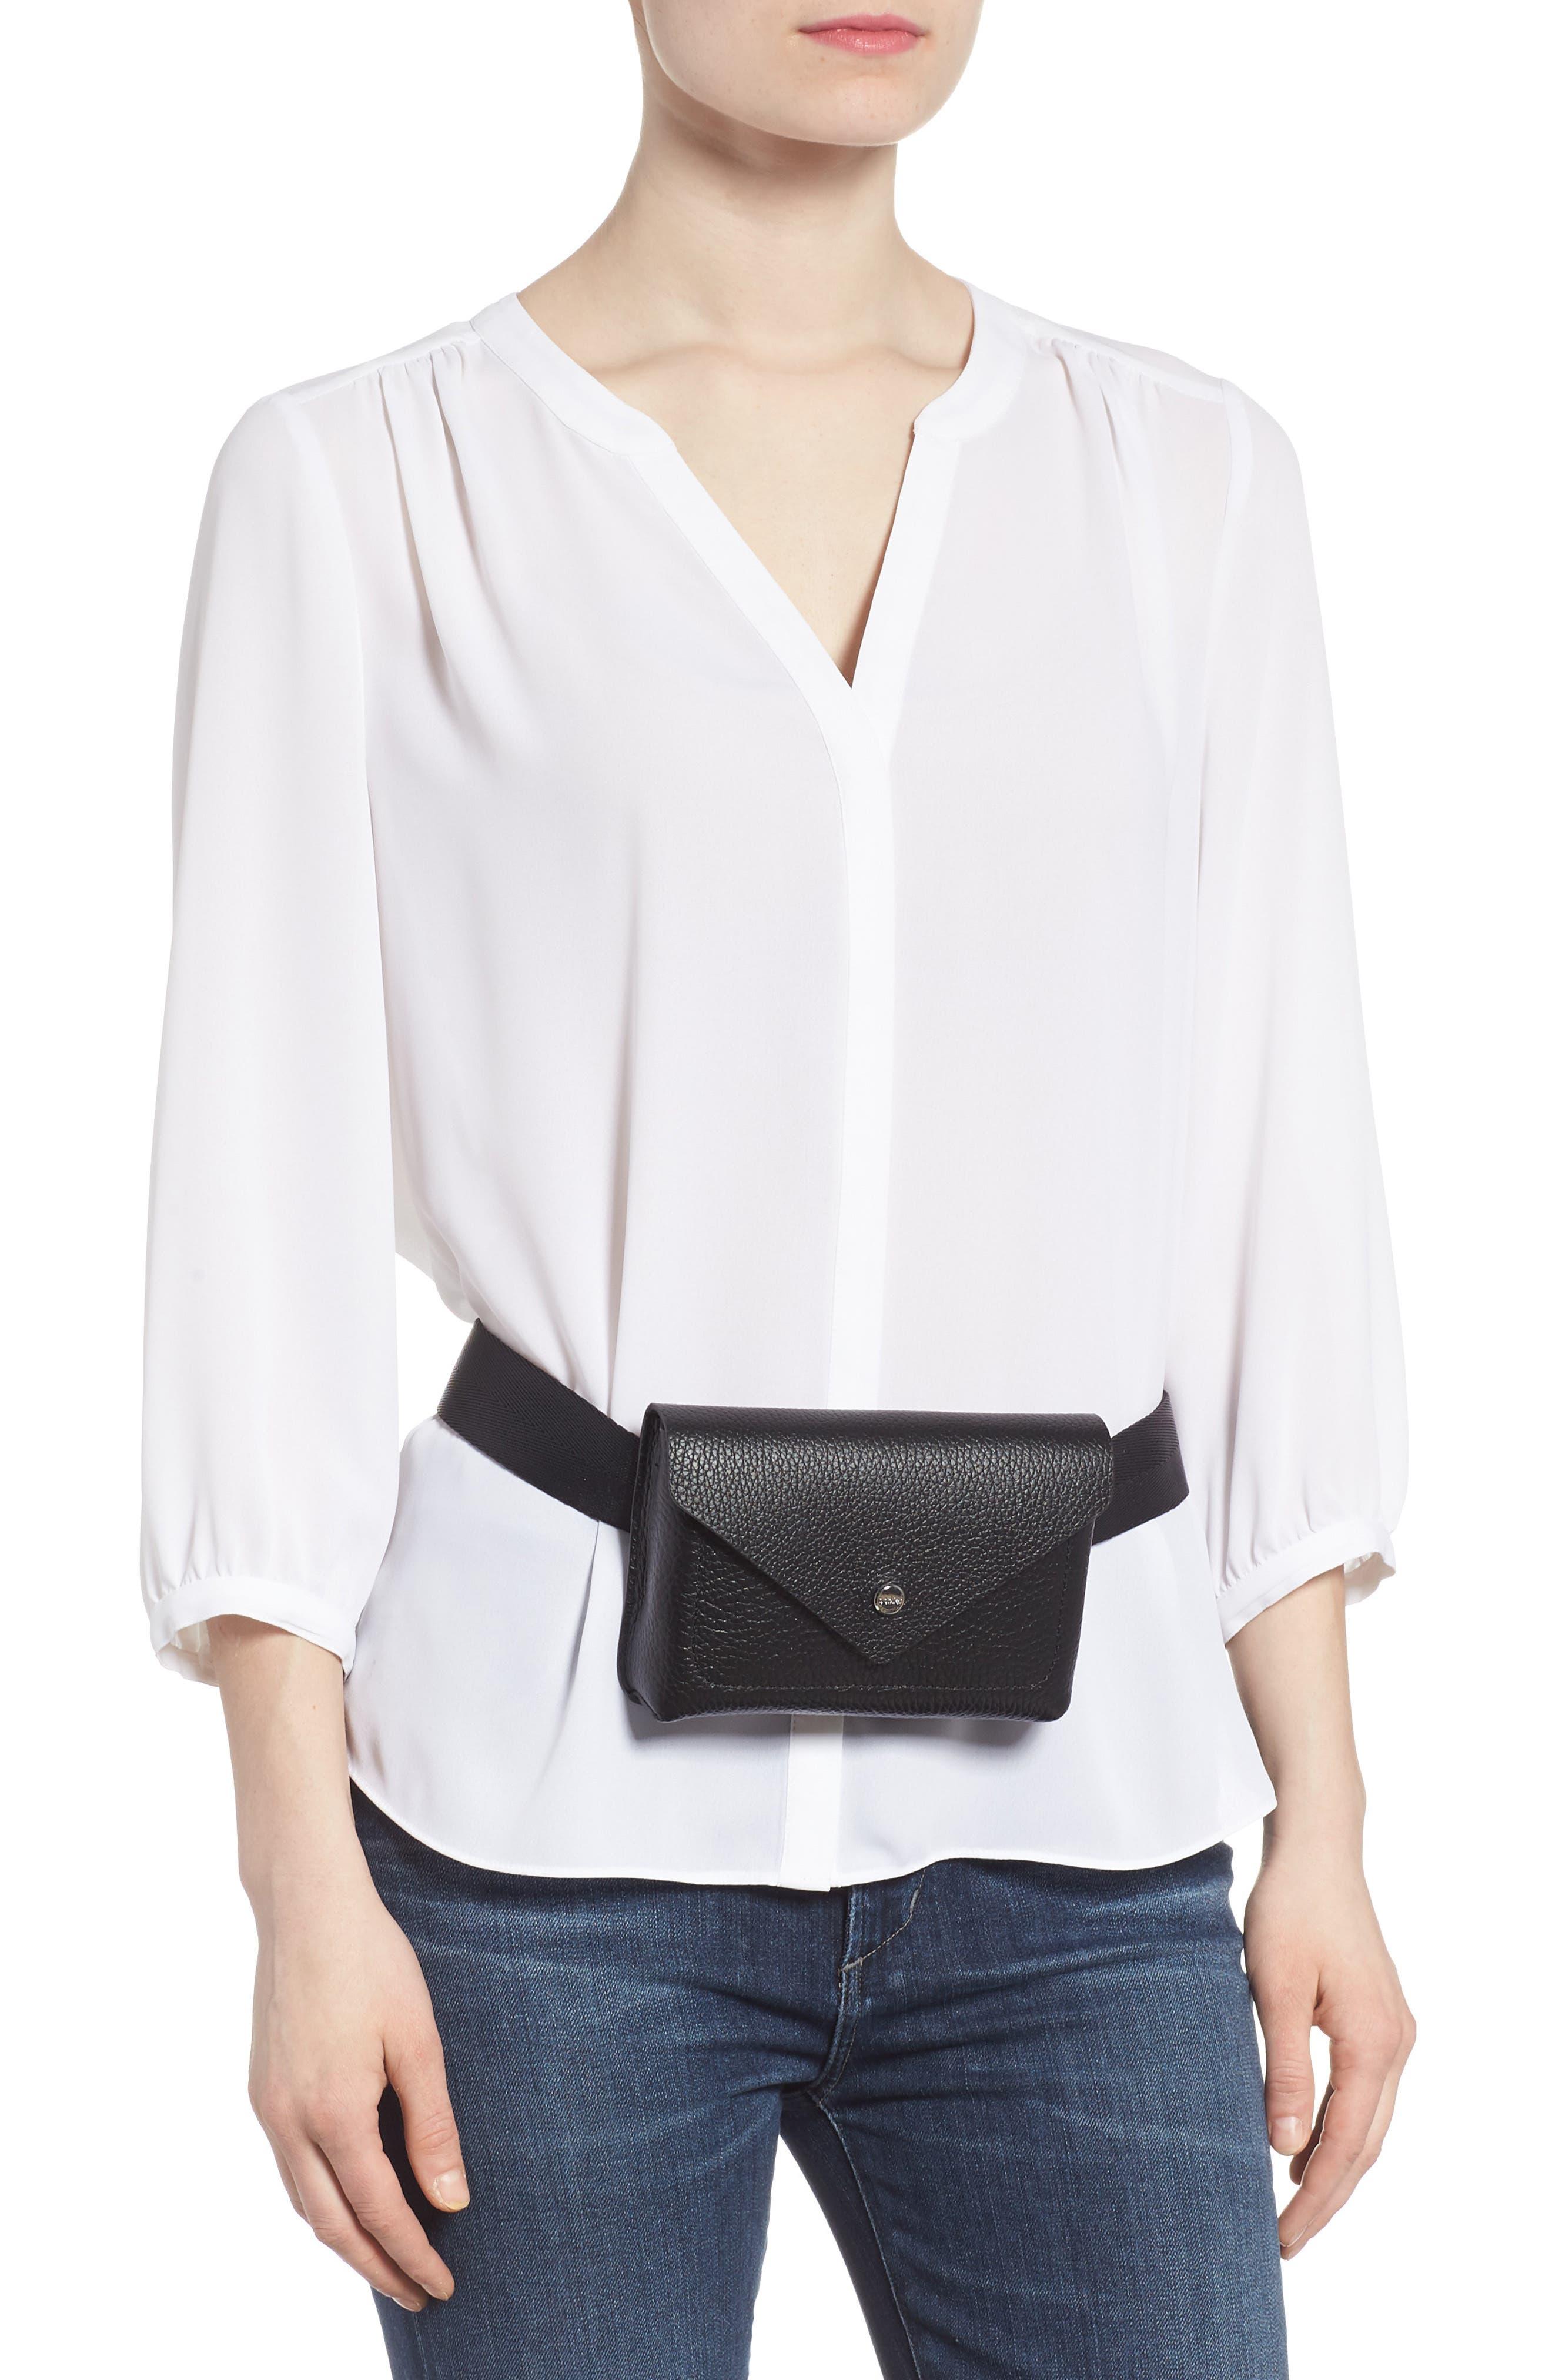 Vivi Calfskin Leather Convertible Belt Bag,                             Alternate thumbnail 2, color,                             BLACK